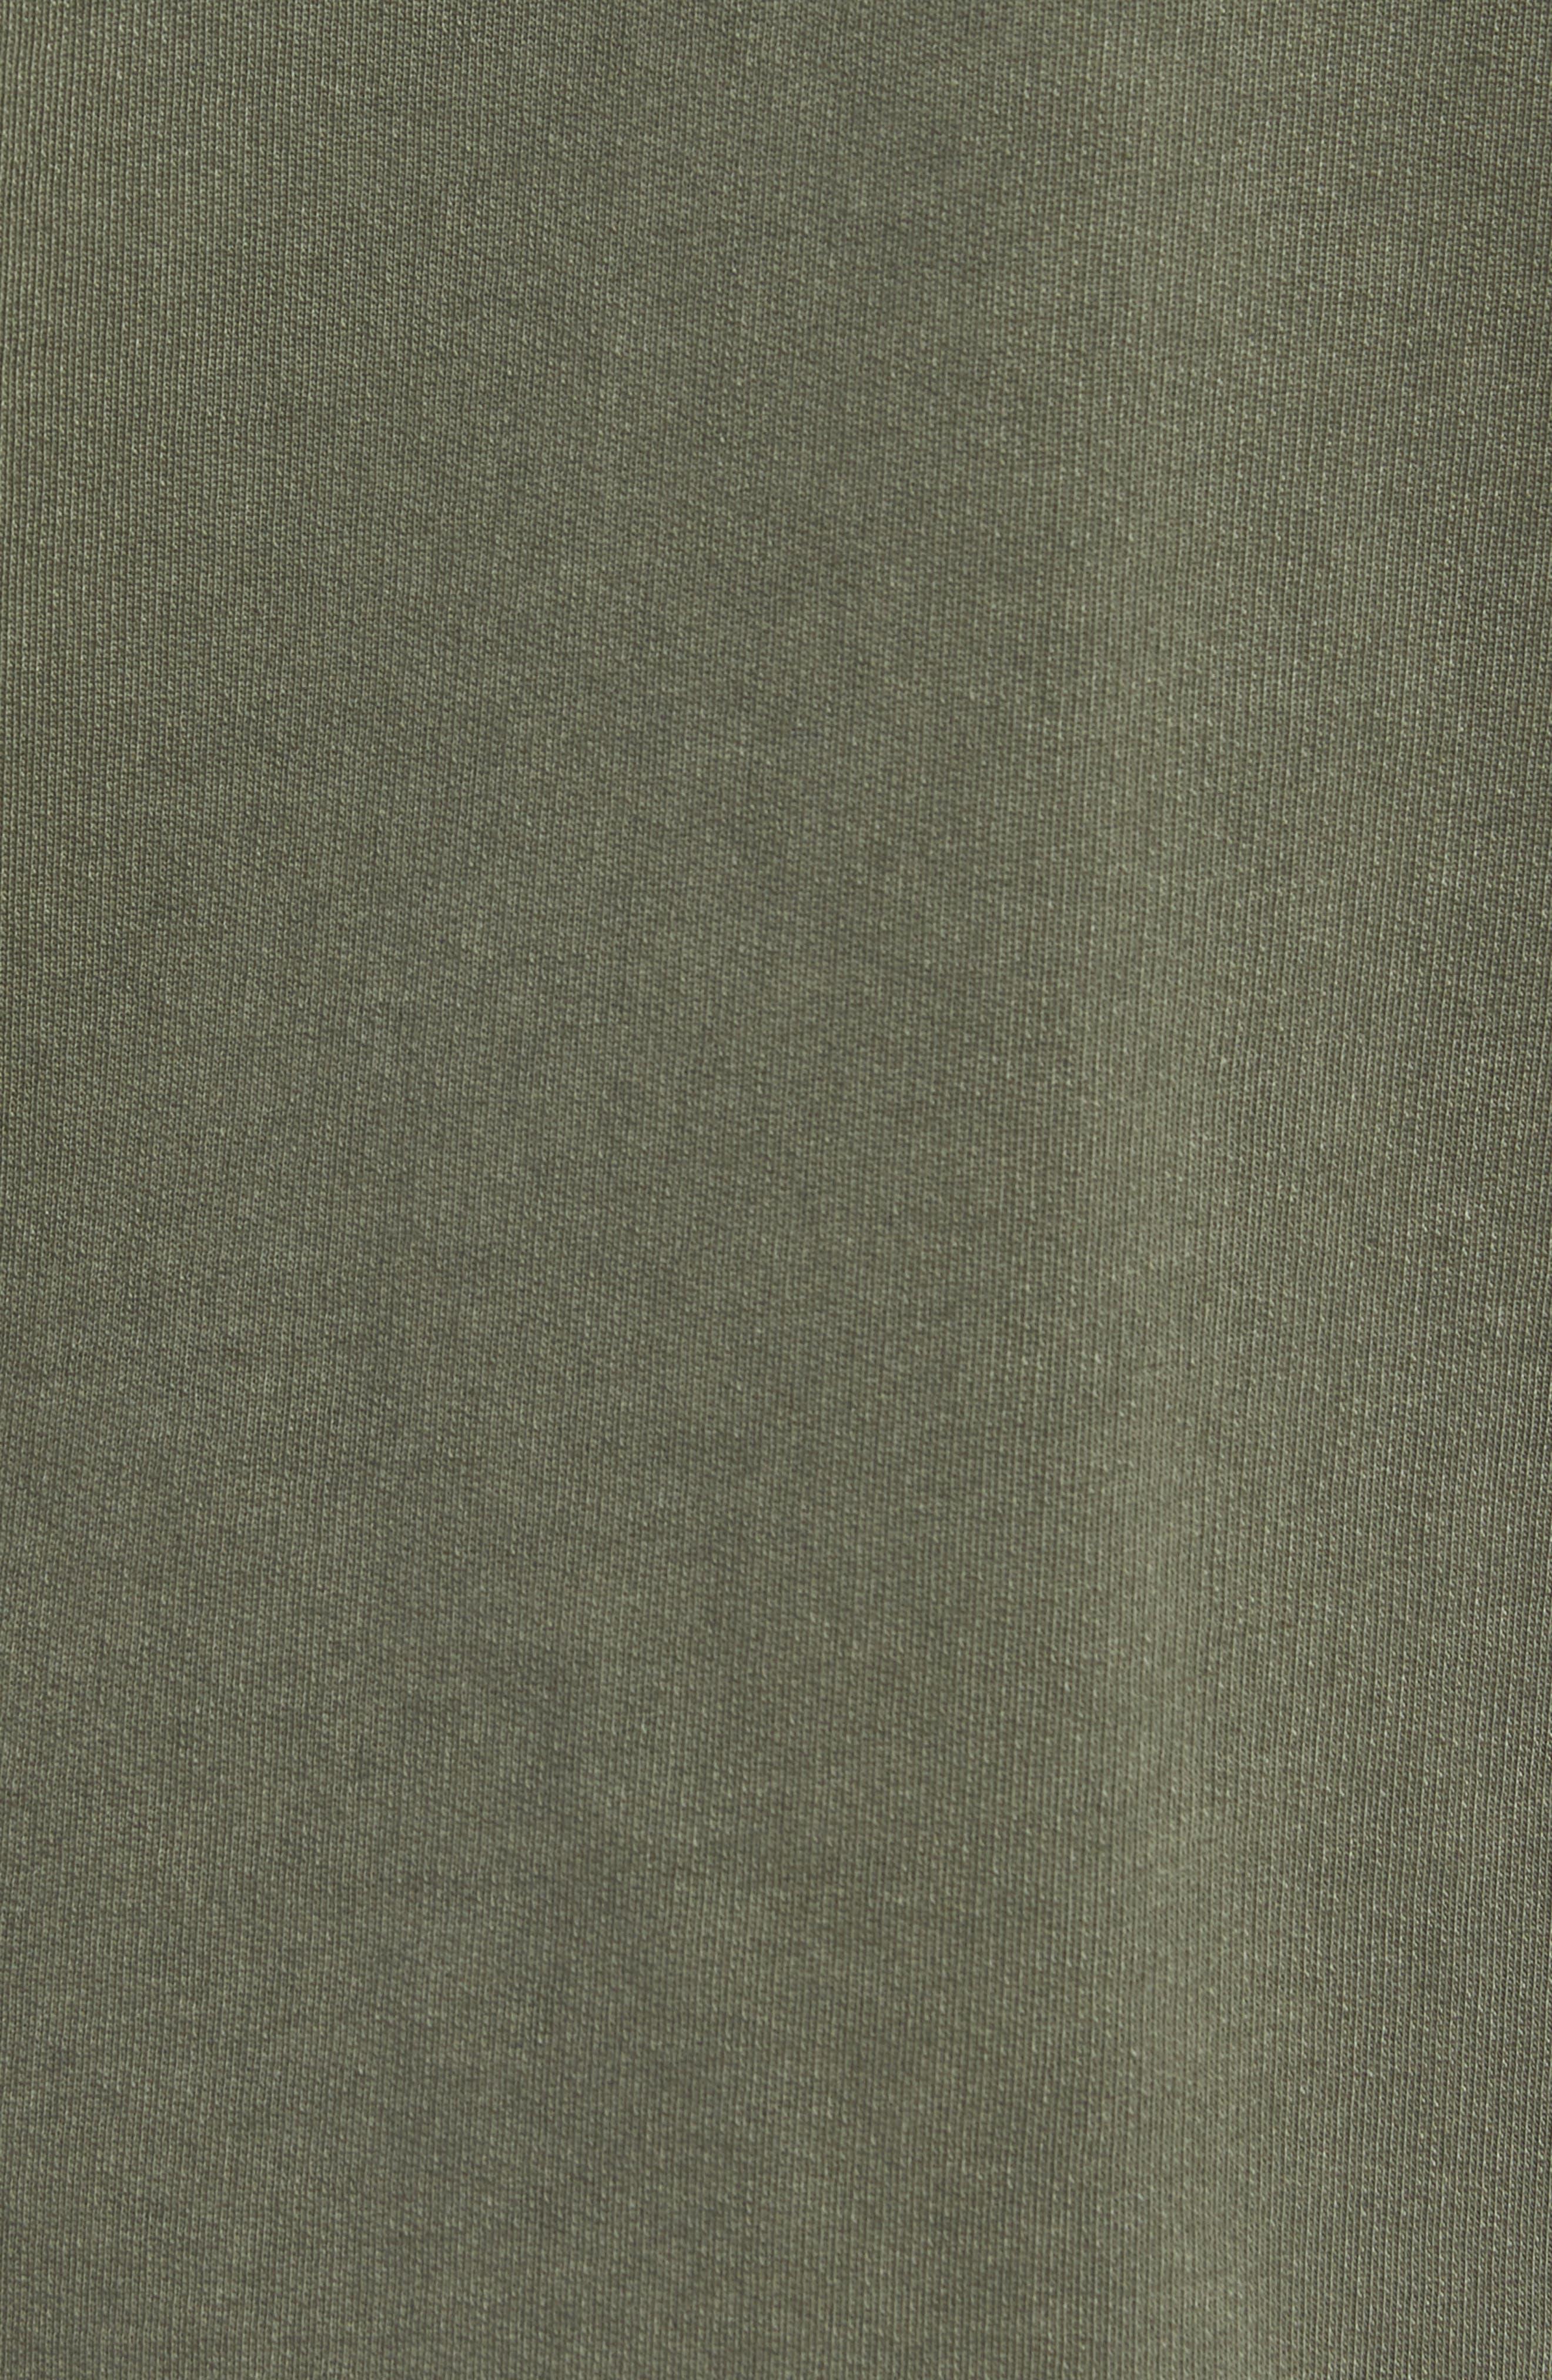 Patchwork Long Sleeve T-Shirt,                             Alternate thumbnail 5, color,                             COMBAT